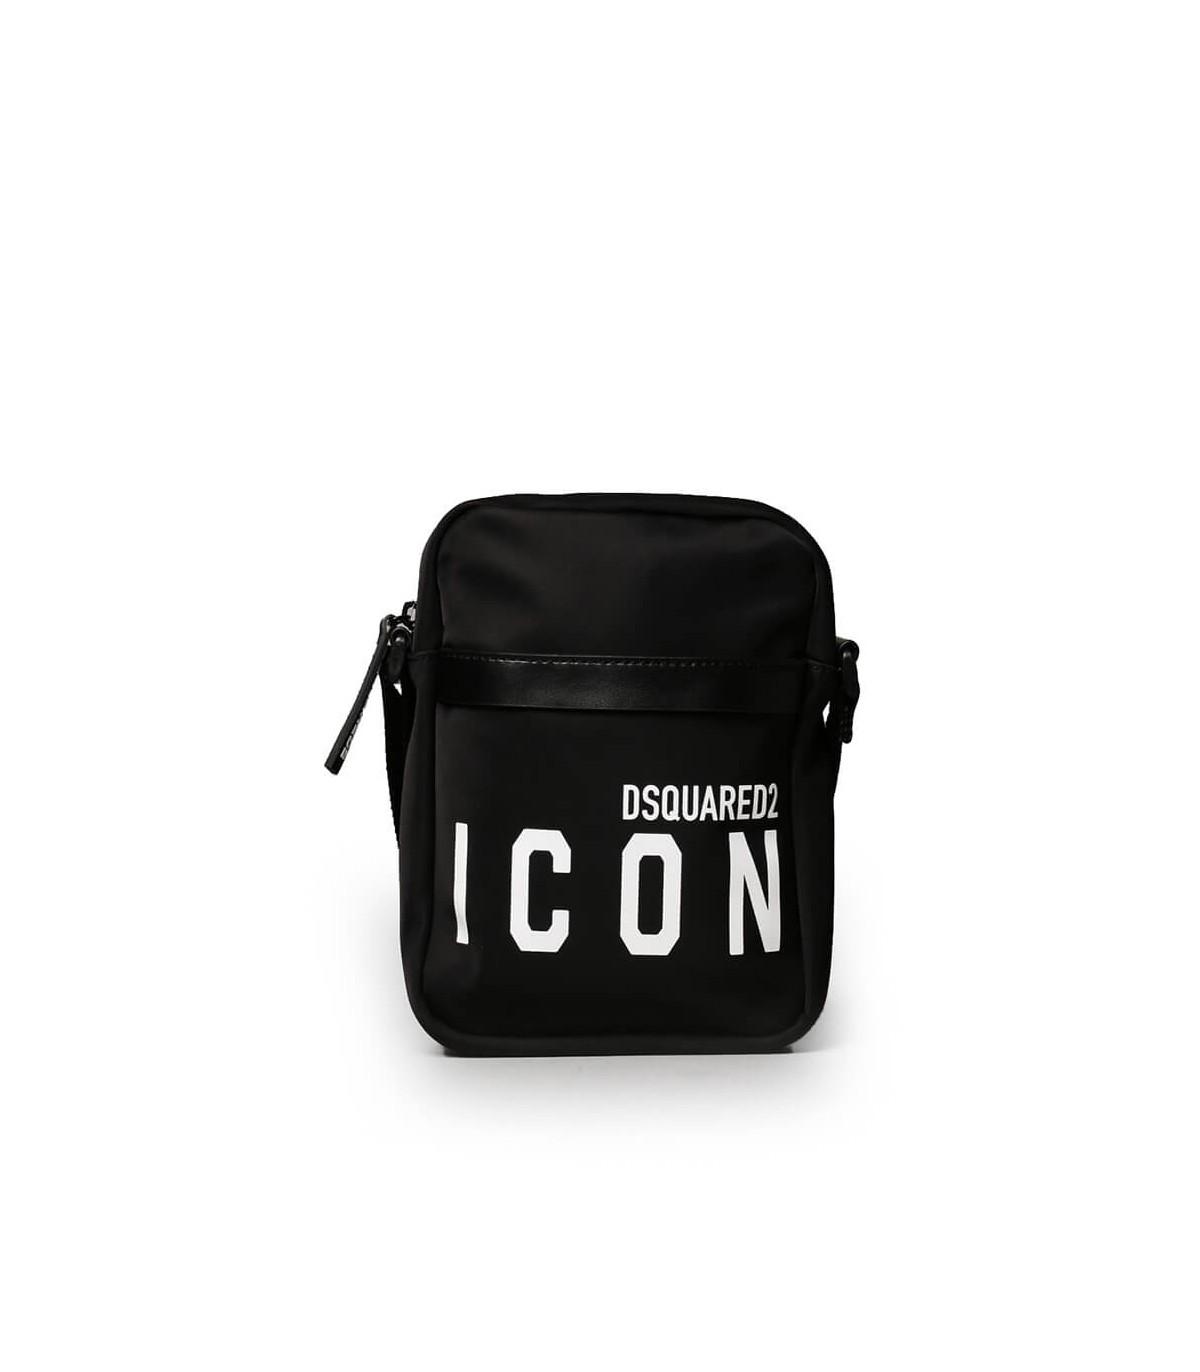 Dsquared2 Leathers ICON BLACK CROSSBODY BAG